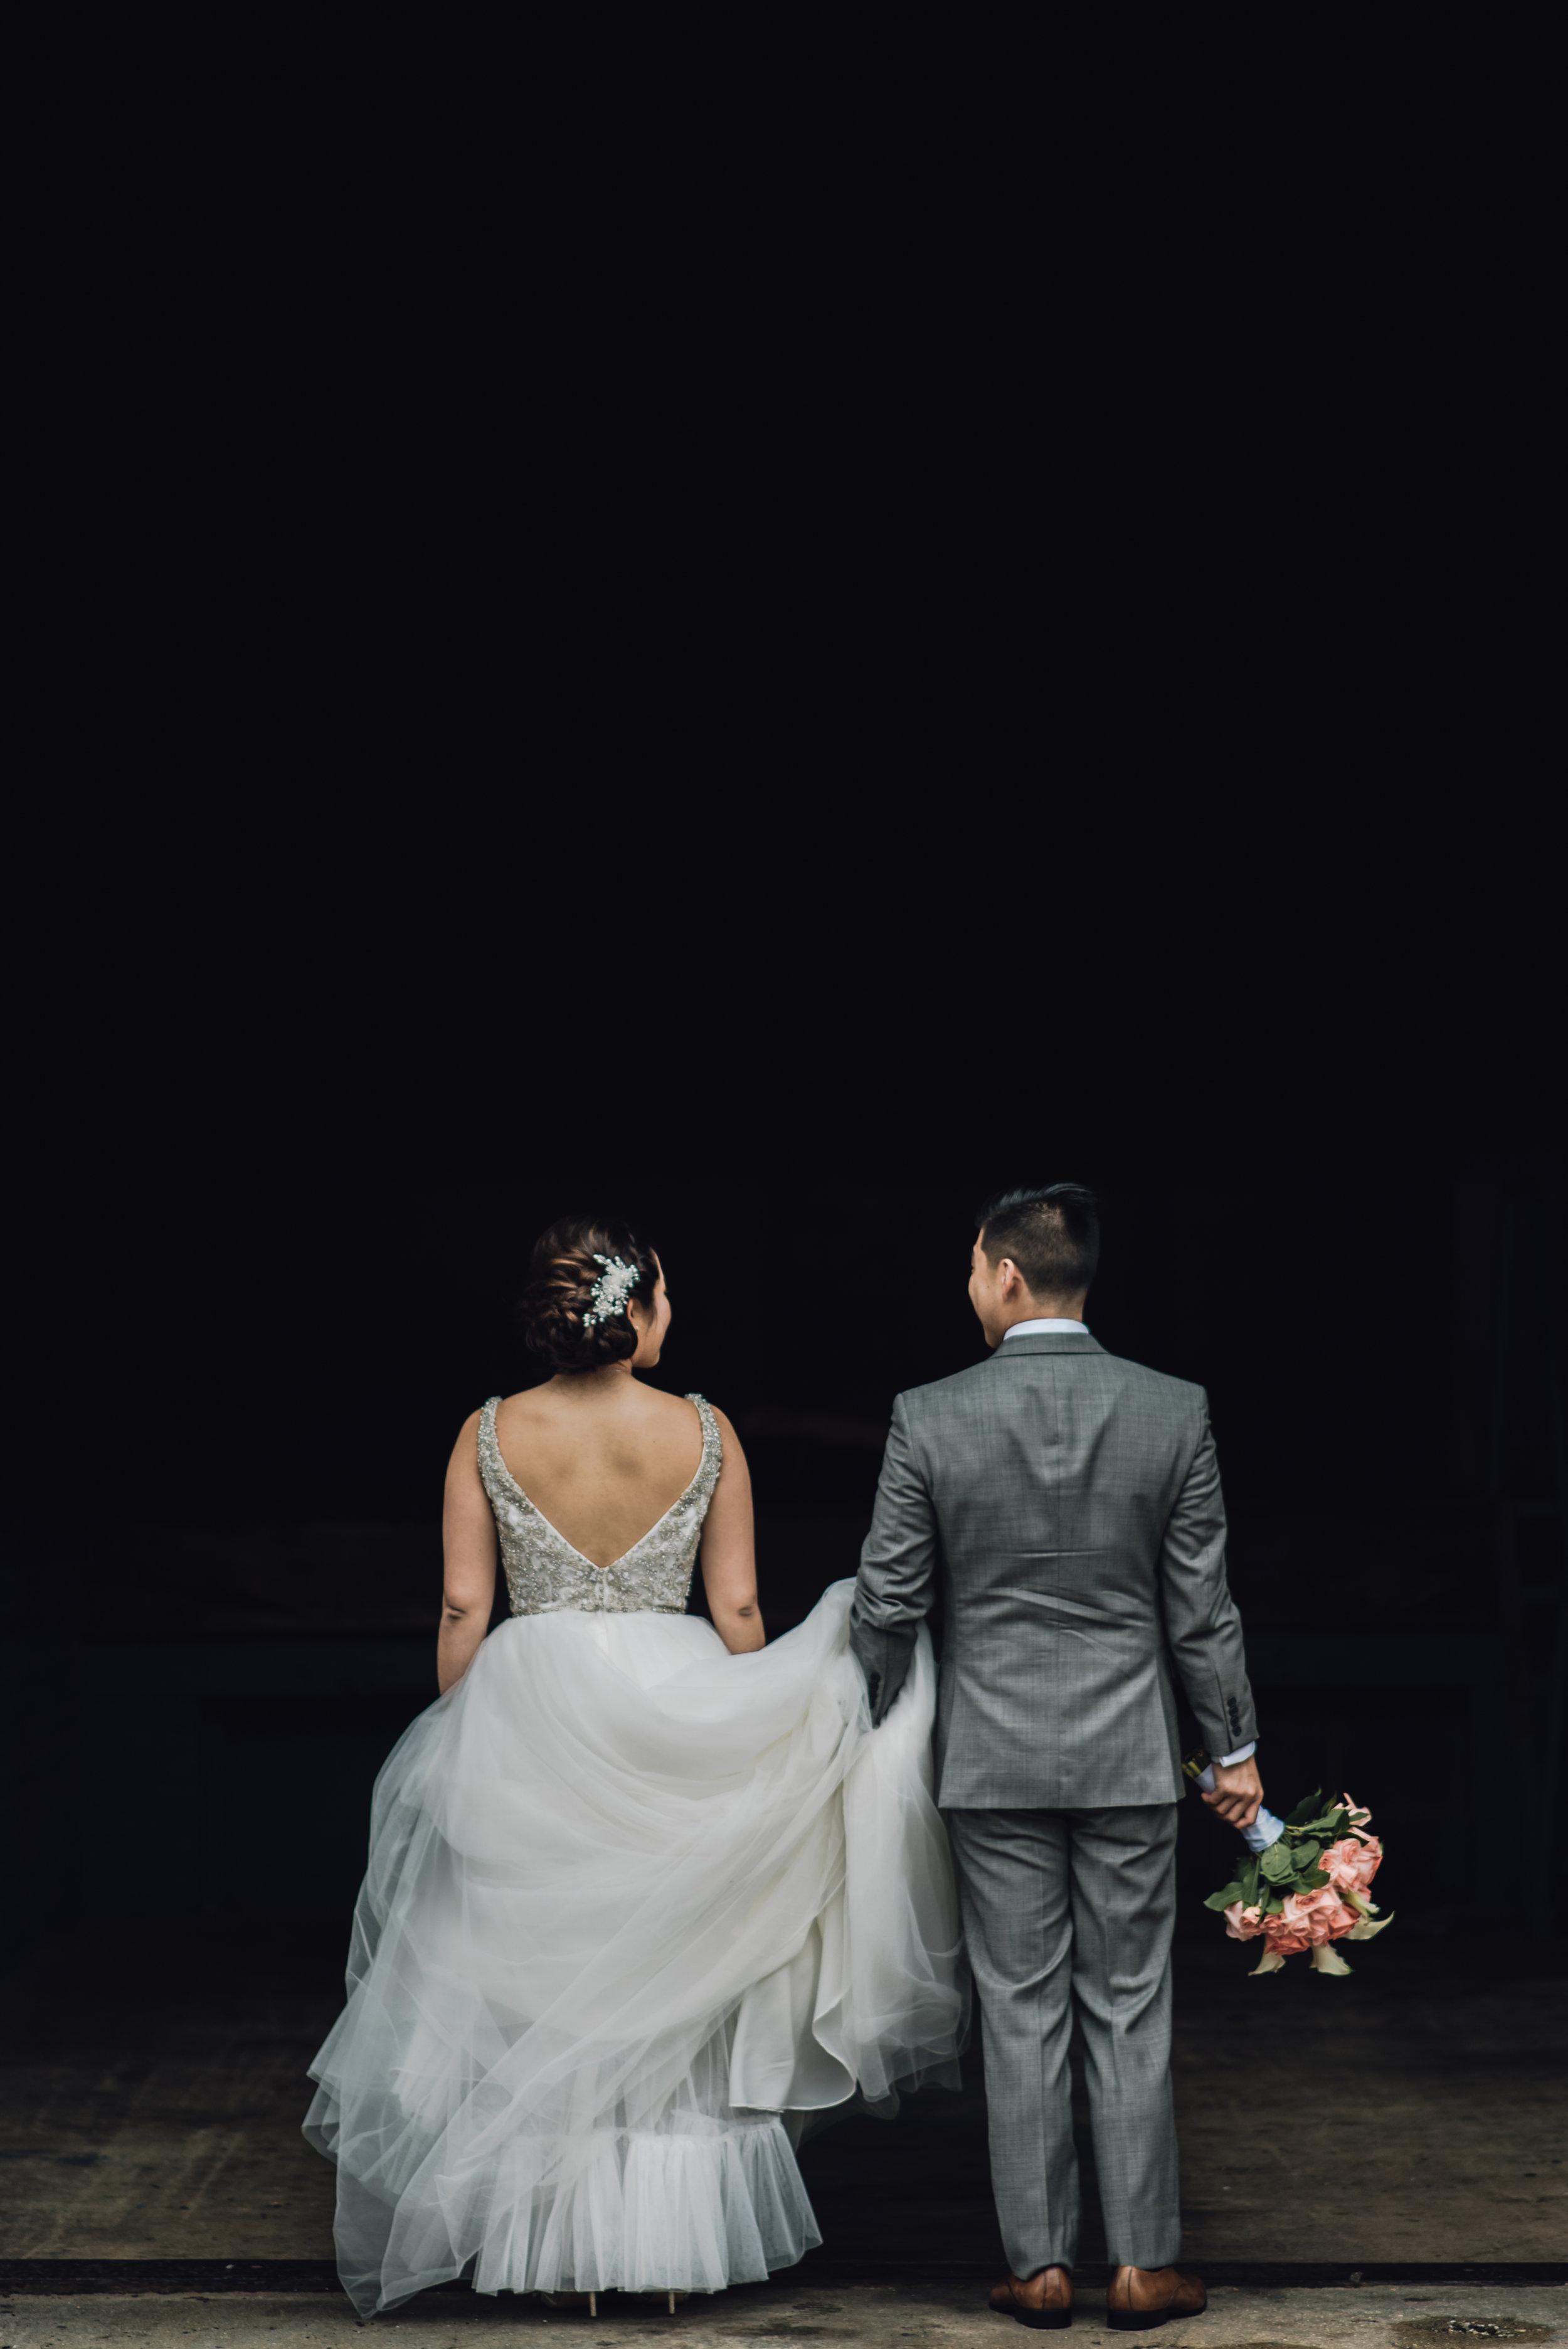 Main and Simple Photography_2017_Weddings_NewYork_TinaJon-428.jpg